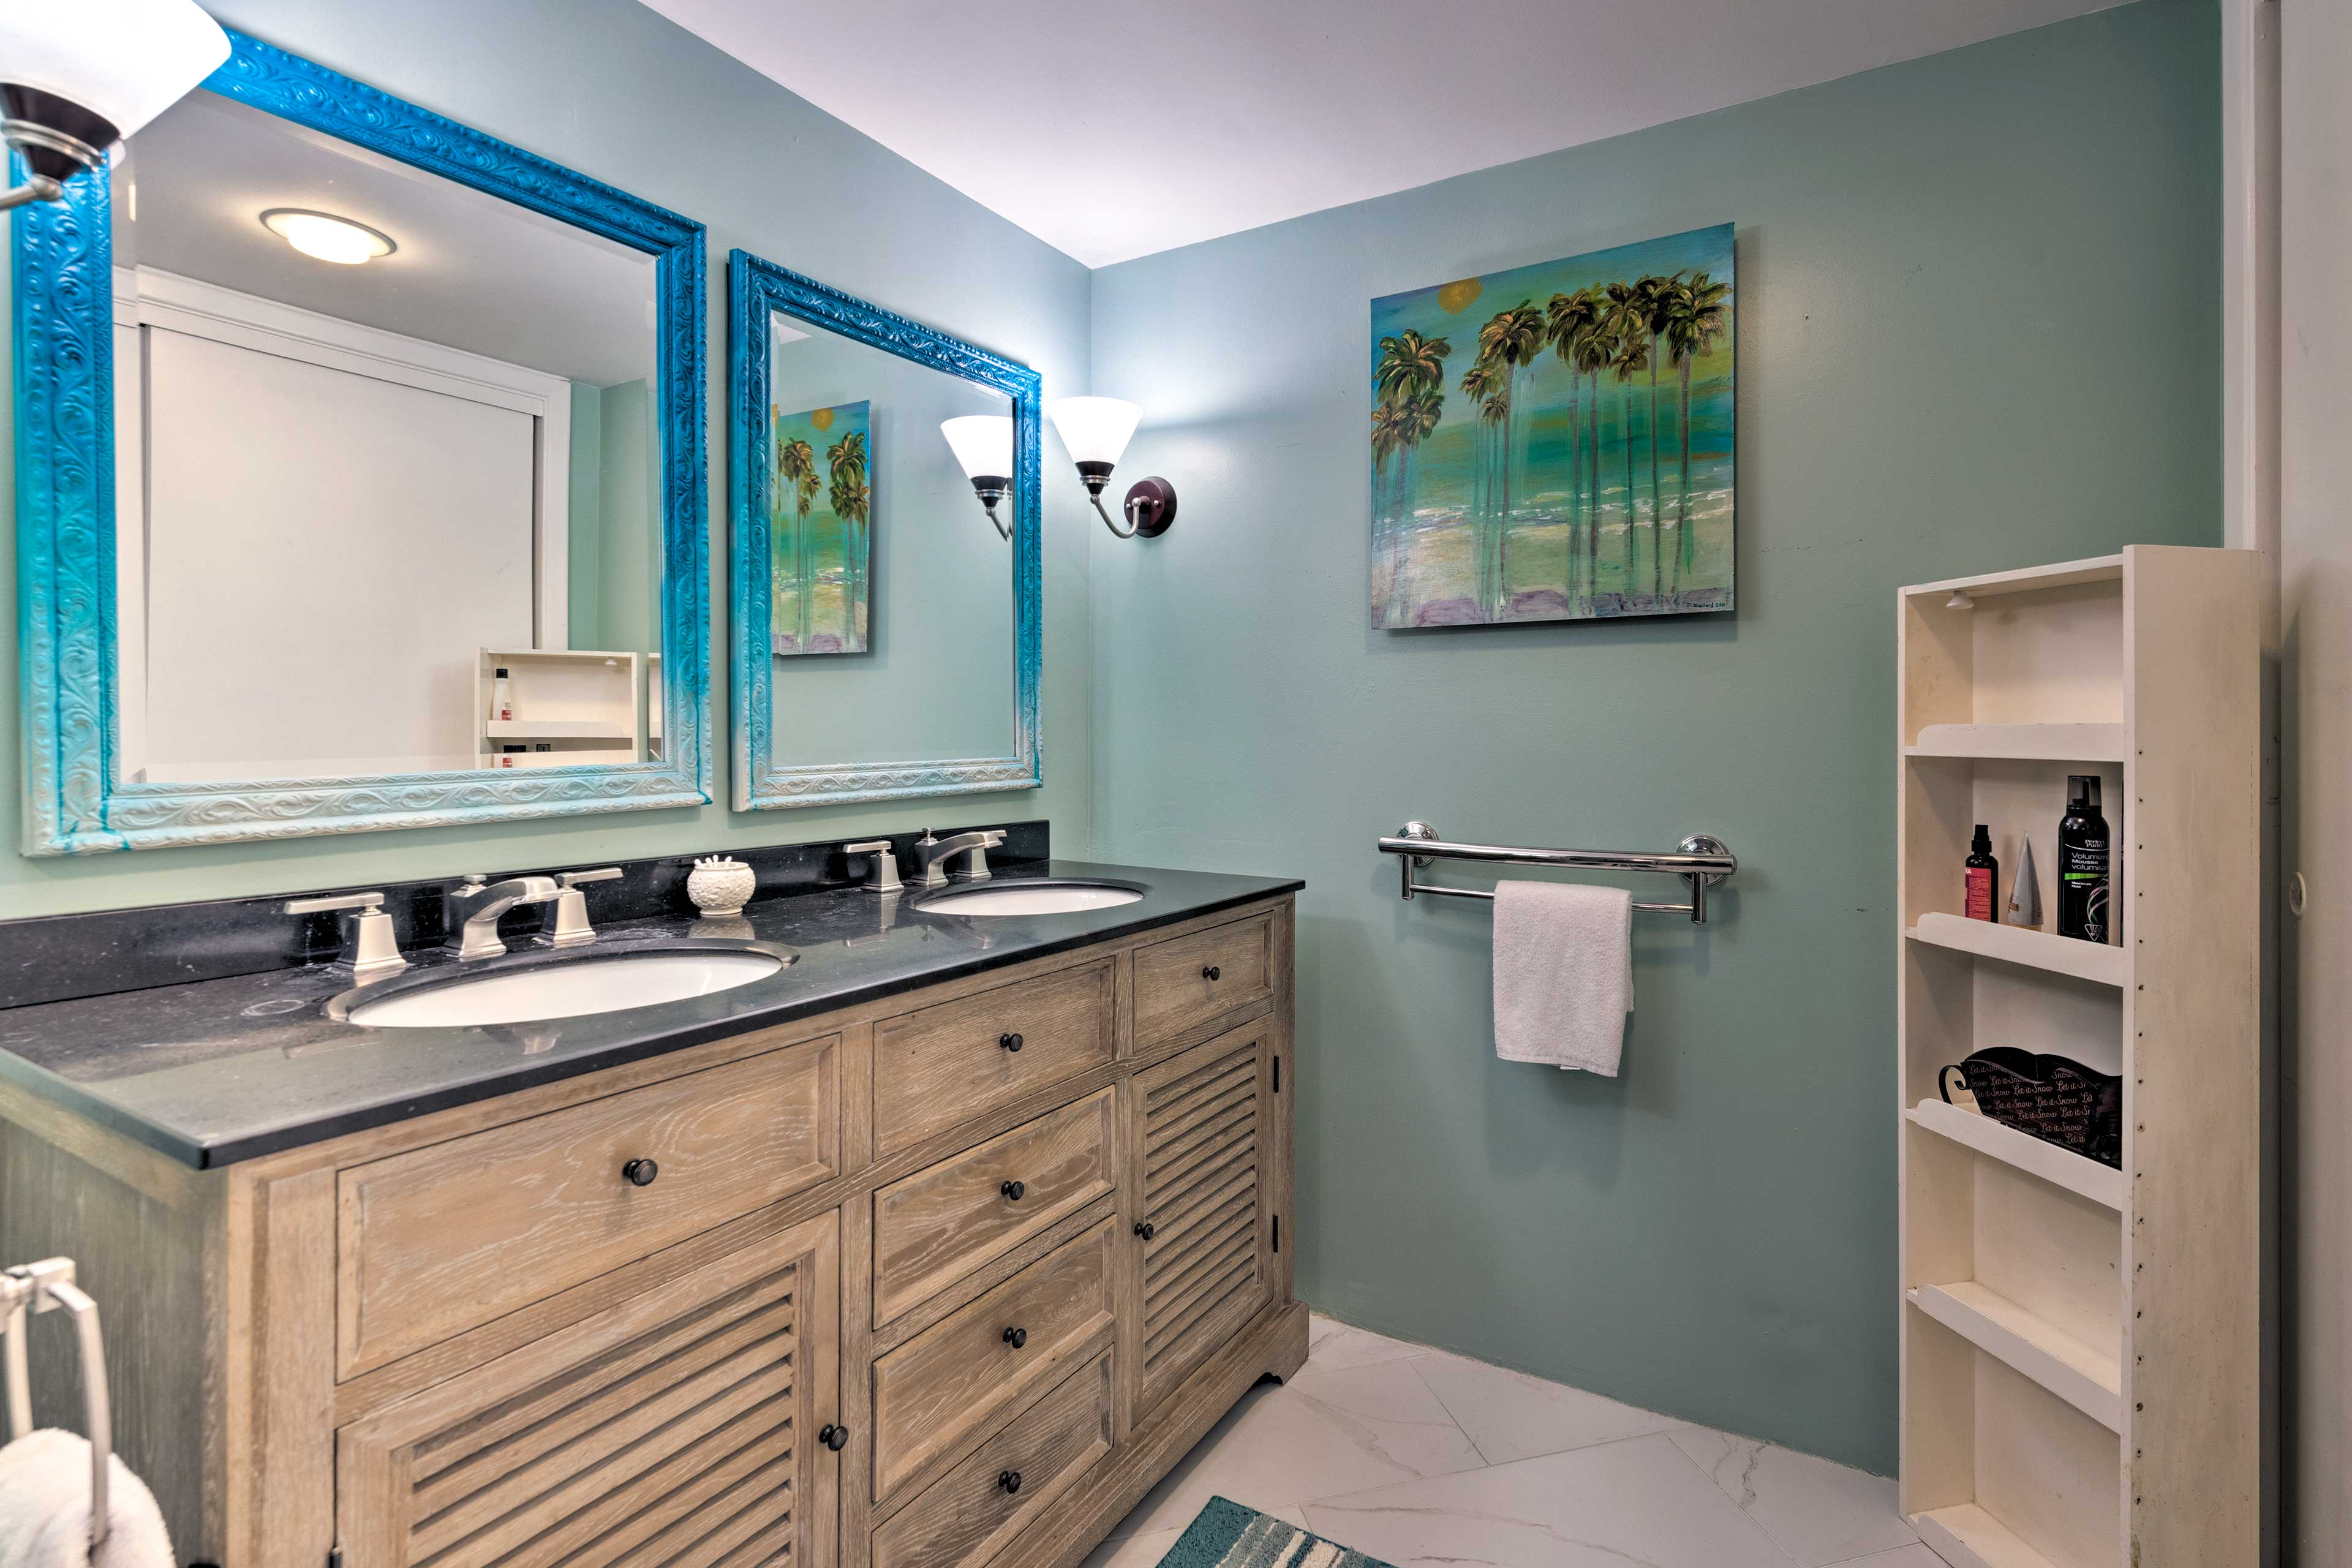 The en-suite bathroom boasts his-and-her sinks.